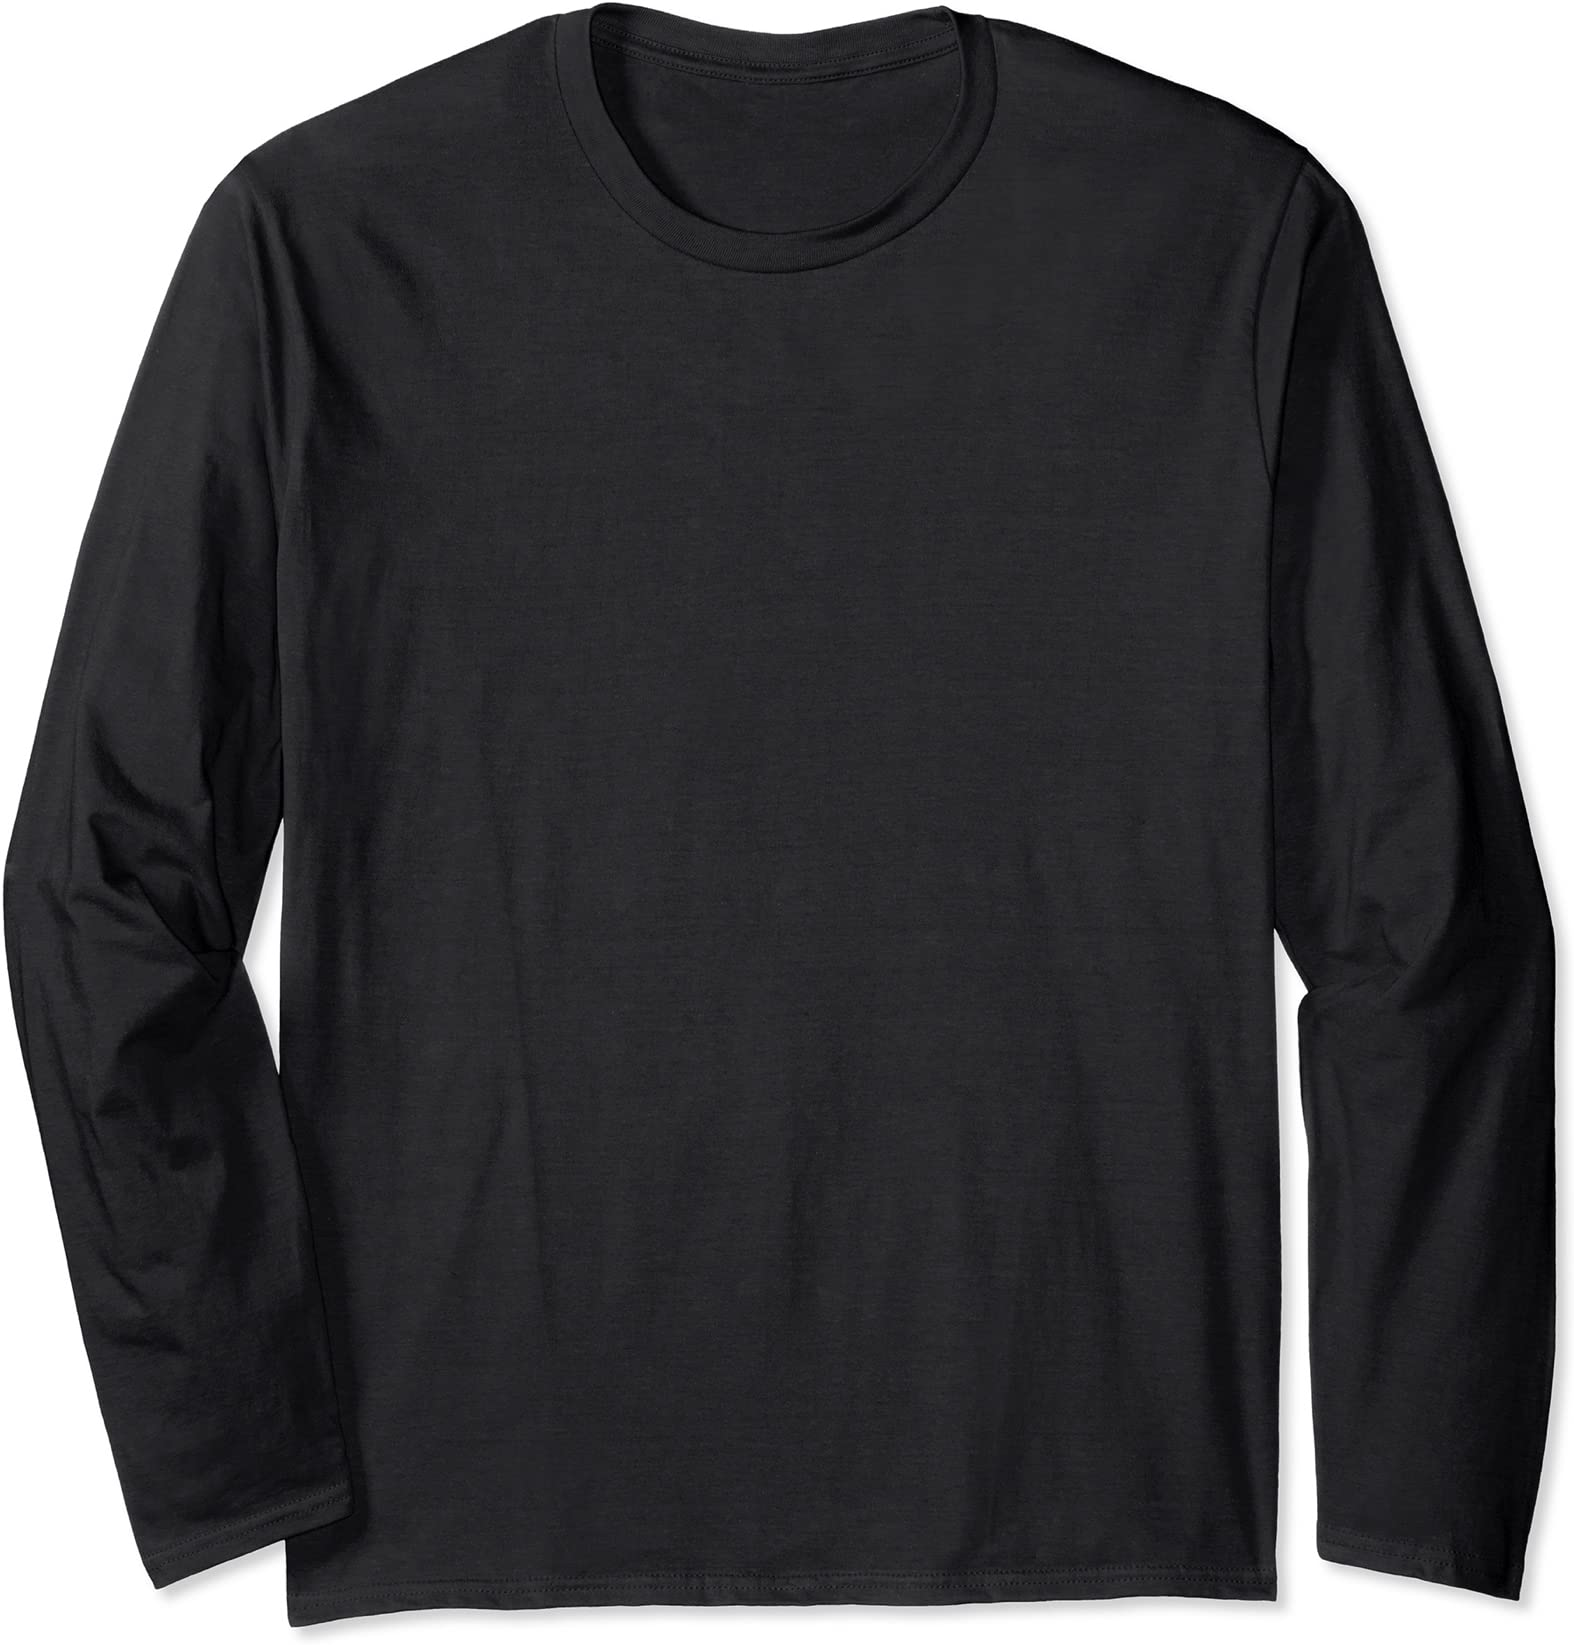 Long Sleeve Shirt I Play The Xylophone Tee Shirt